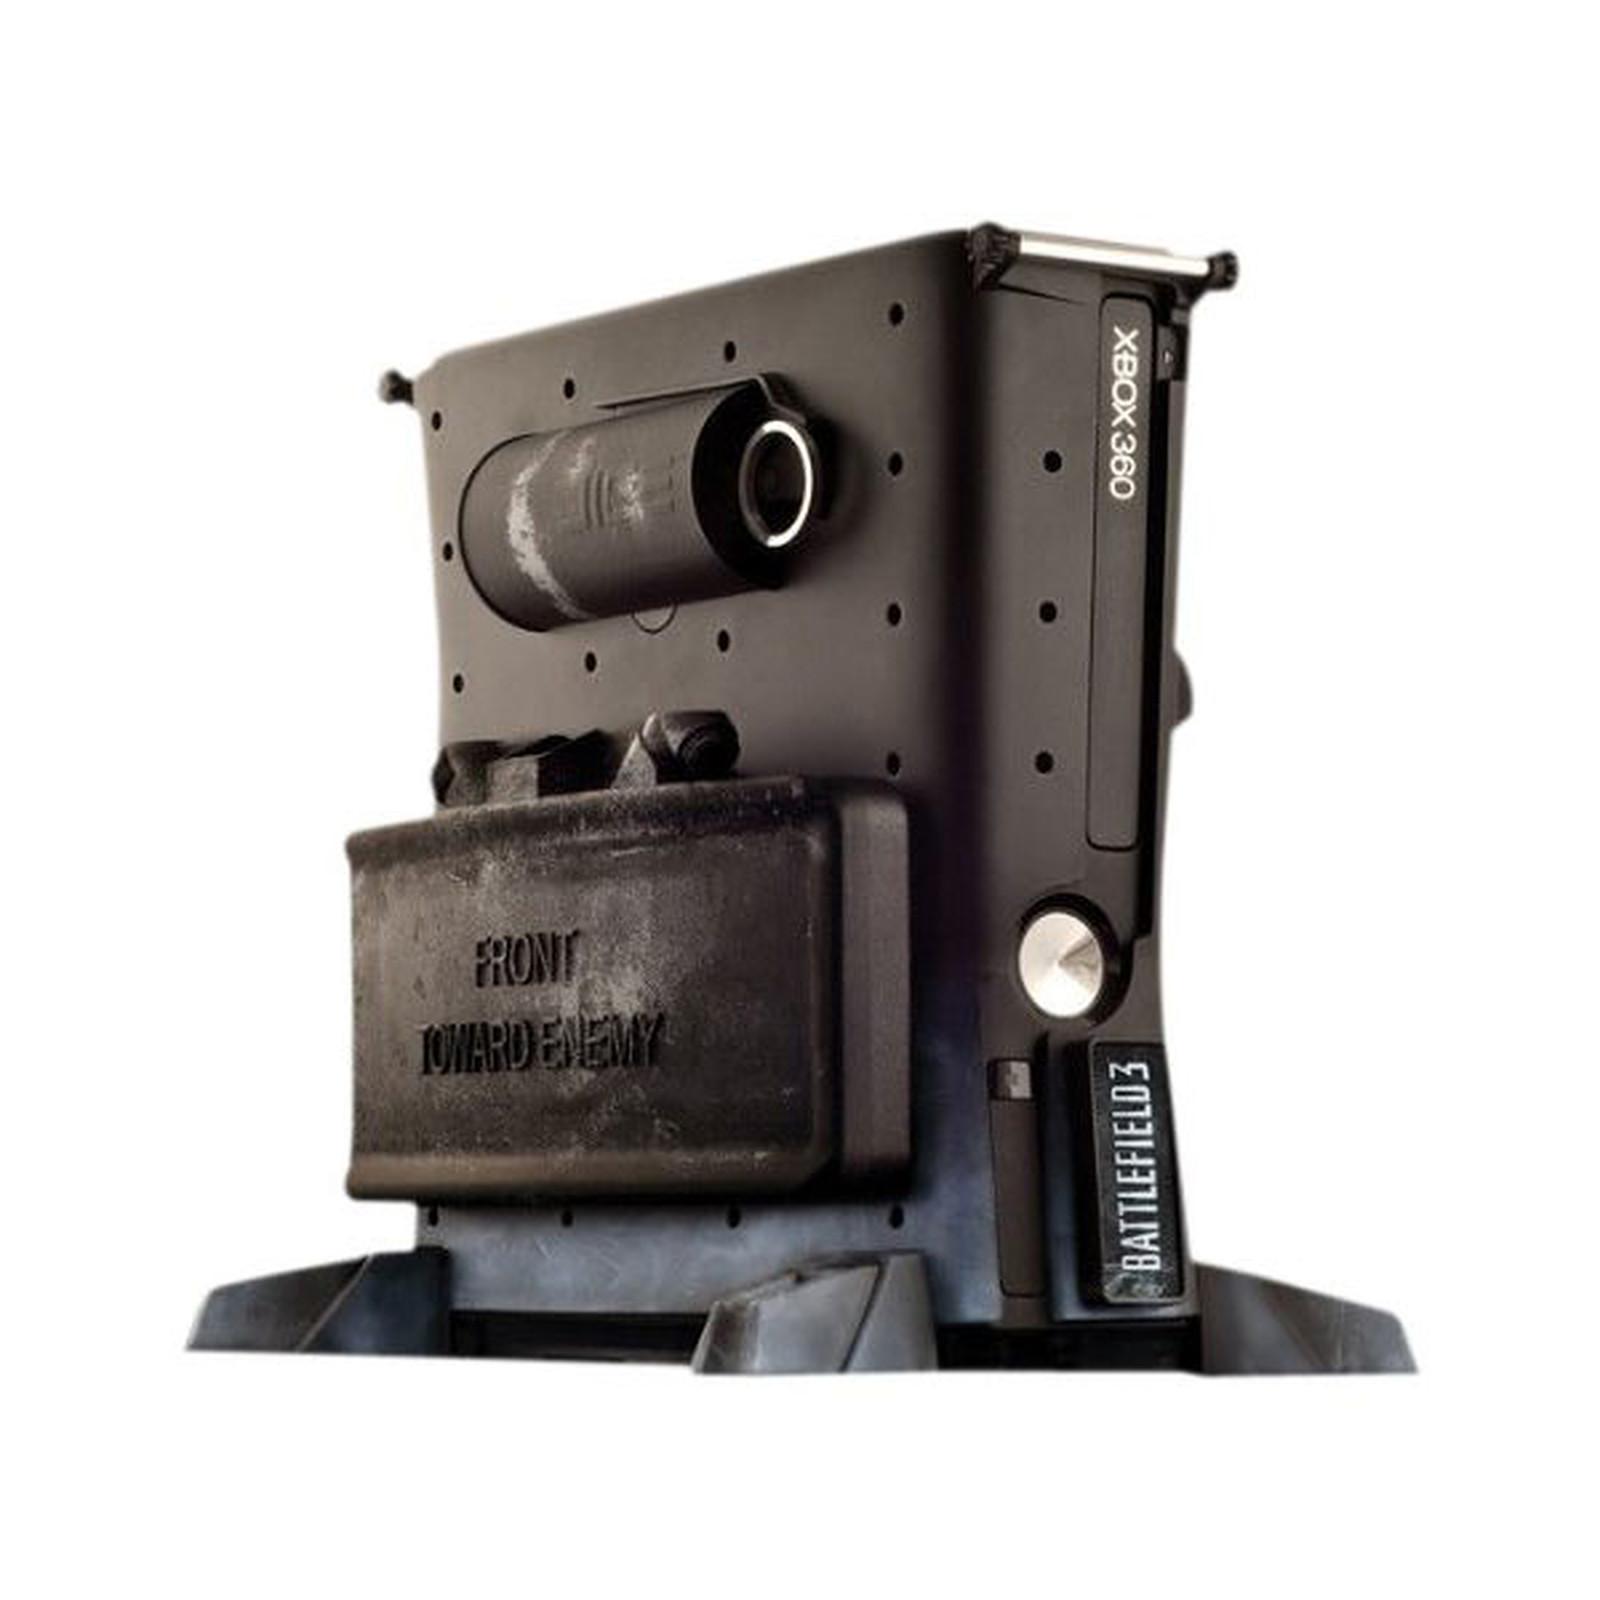 Calibur 11 Coque Vault Battlefield 3 (Xbox 360) - Accessoires Xbox ...